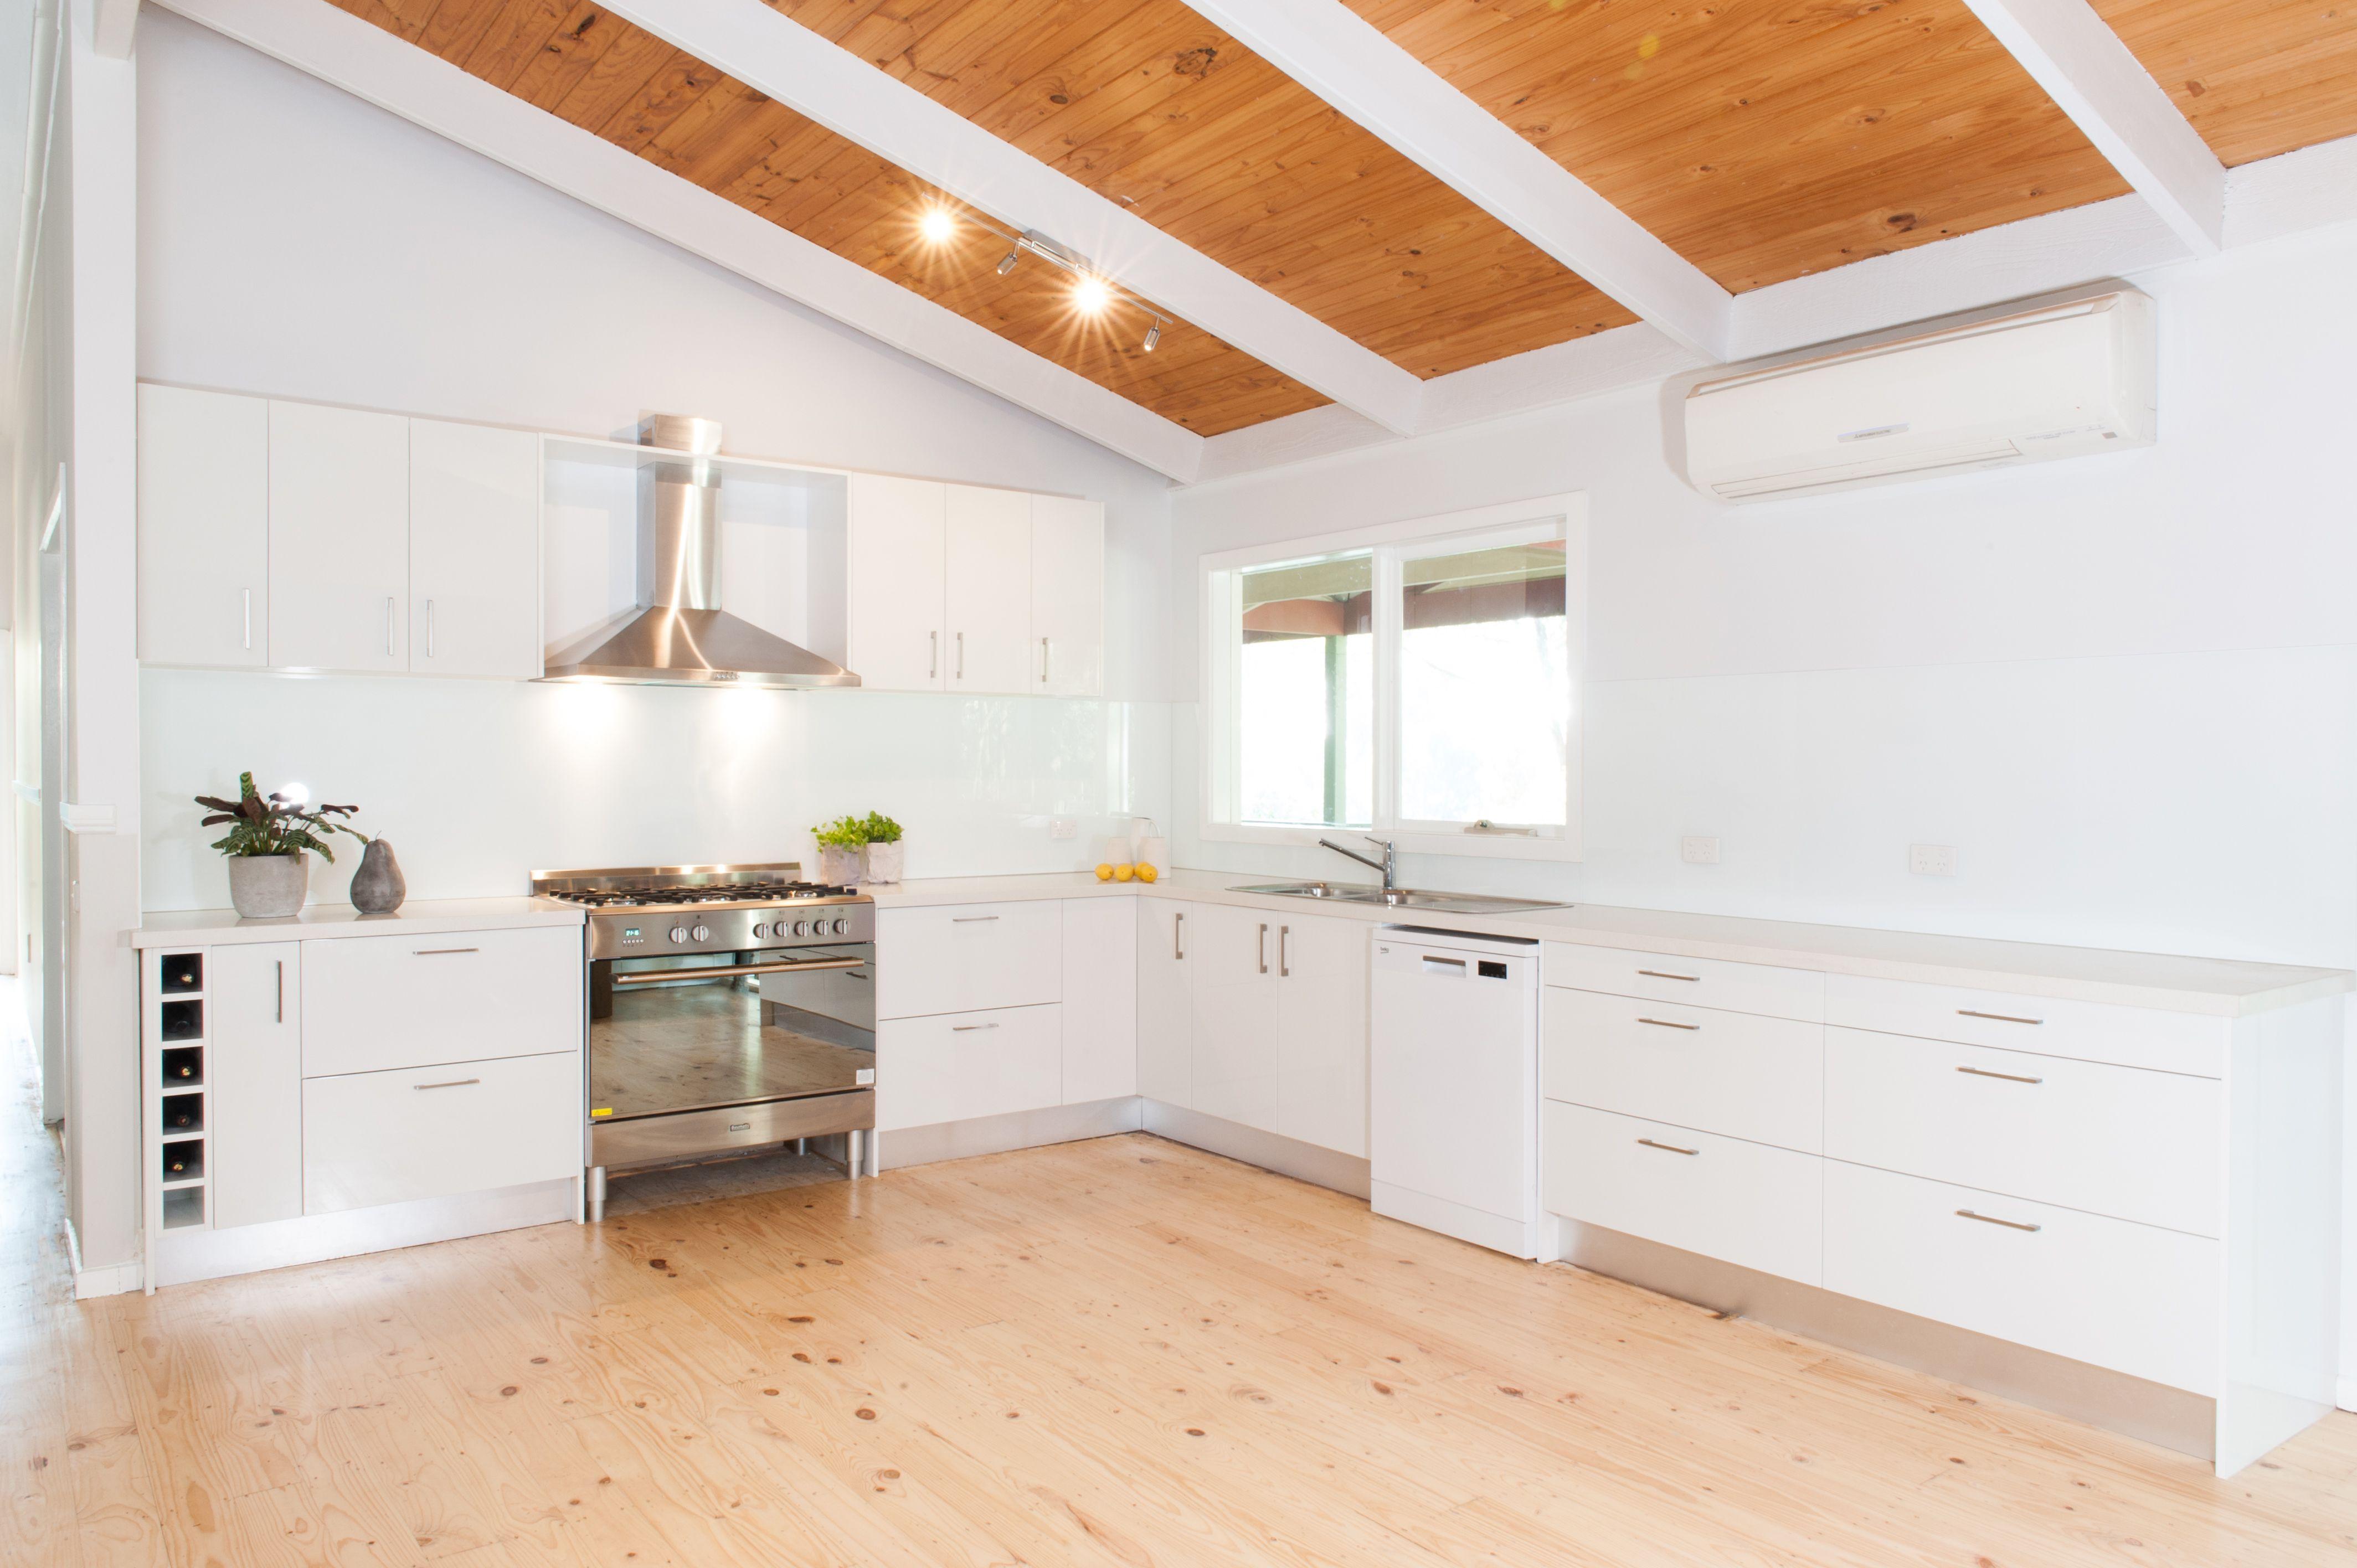 Budget Kitchens and Flooring Diy kitchen renovation, Diy